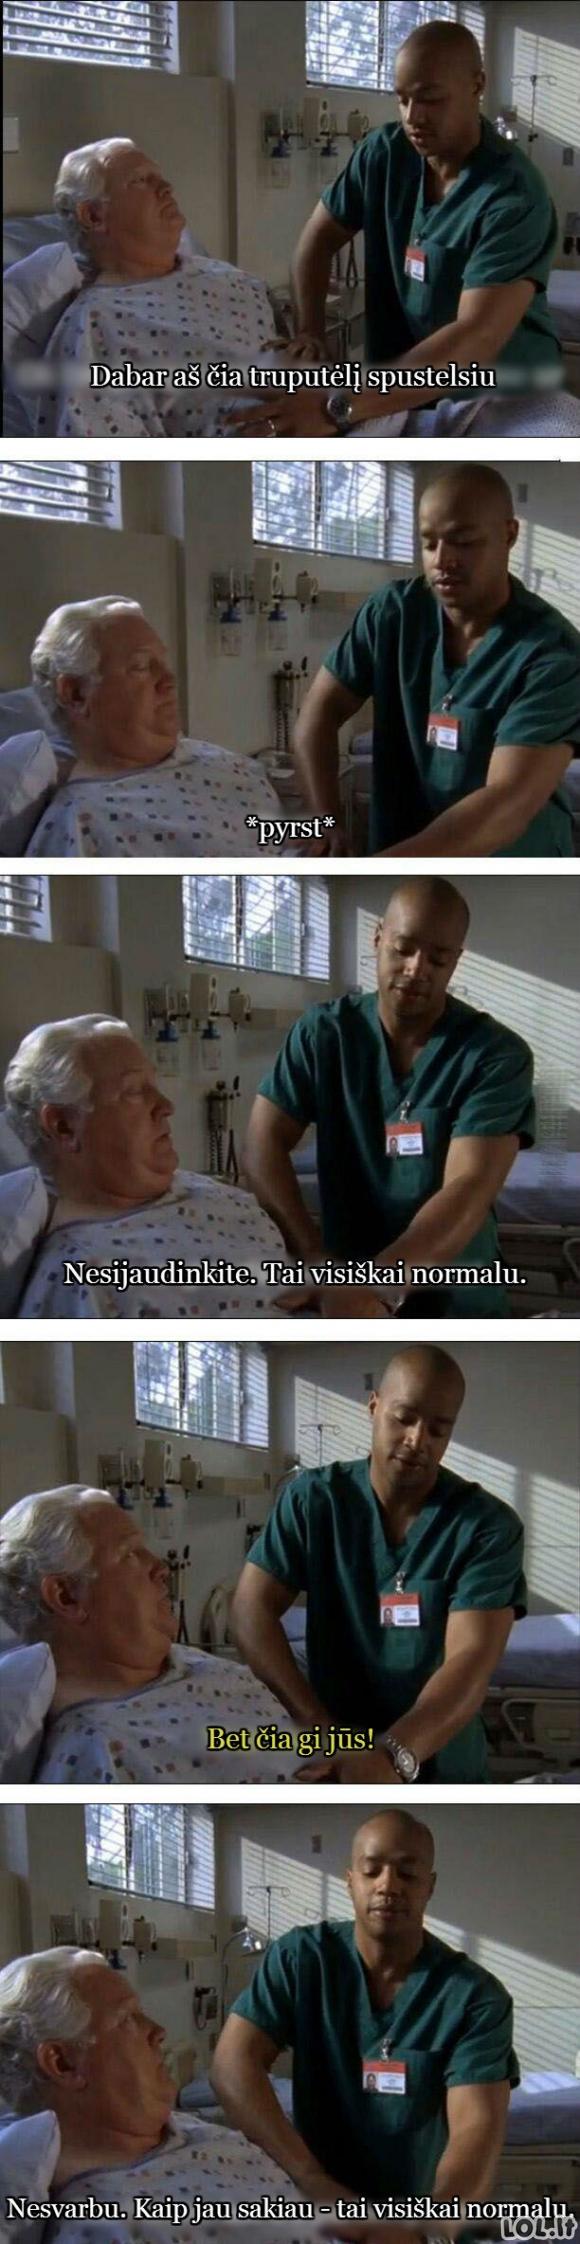 Smirdantis daktaras